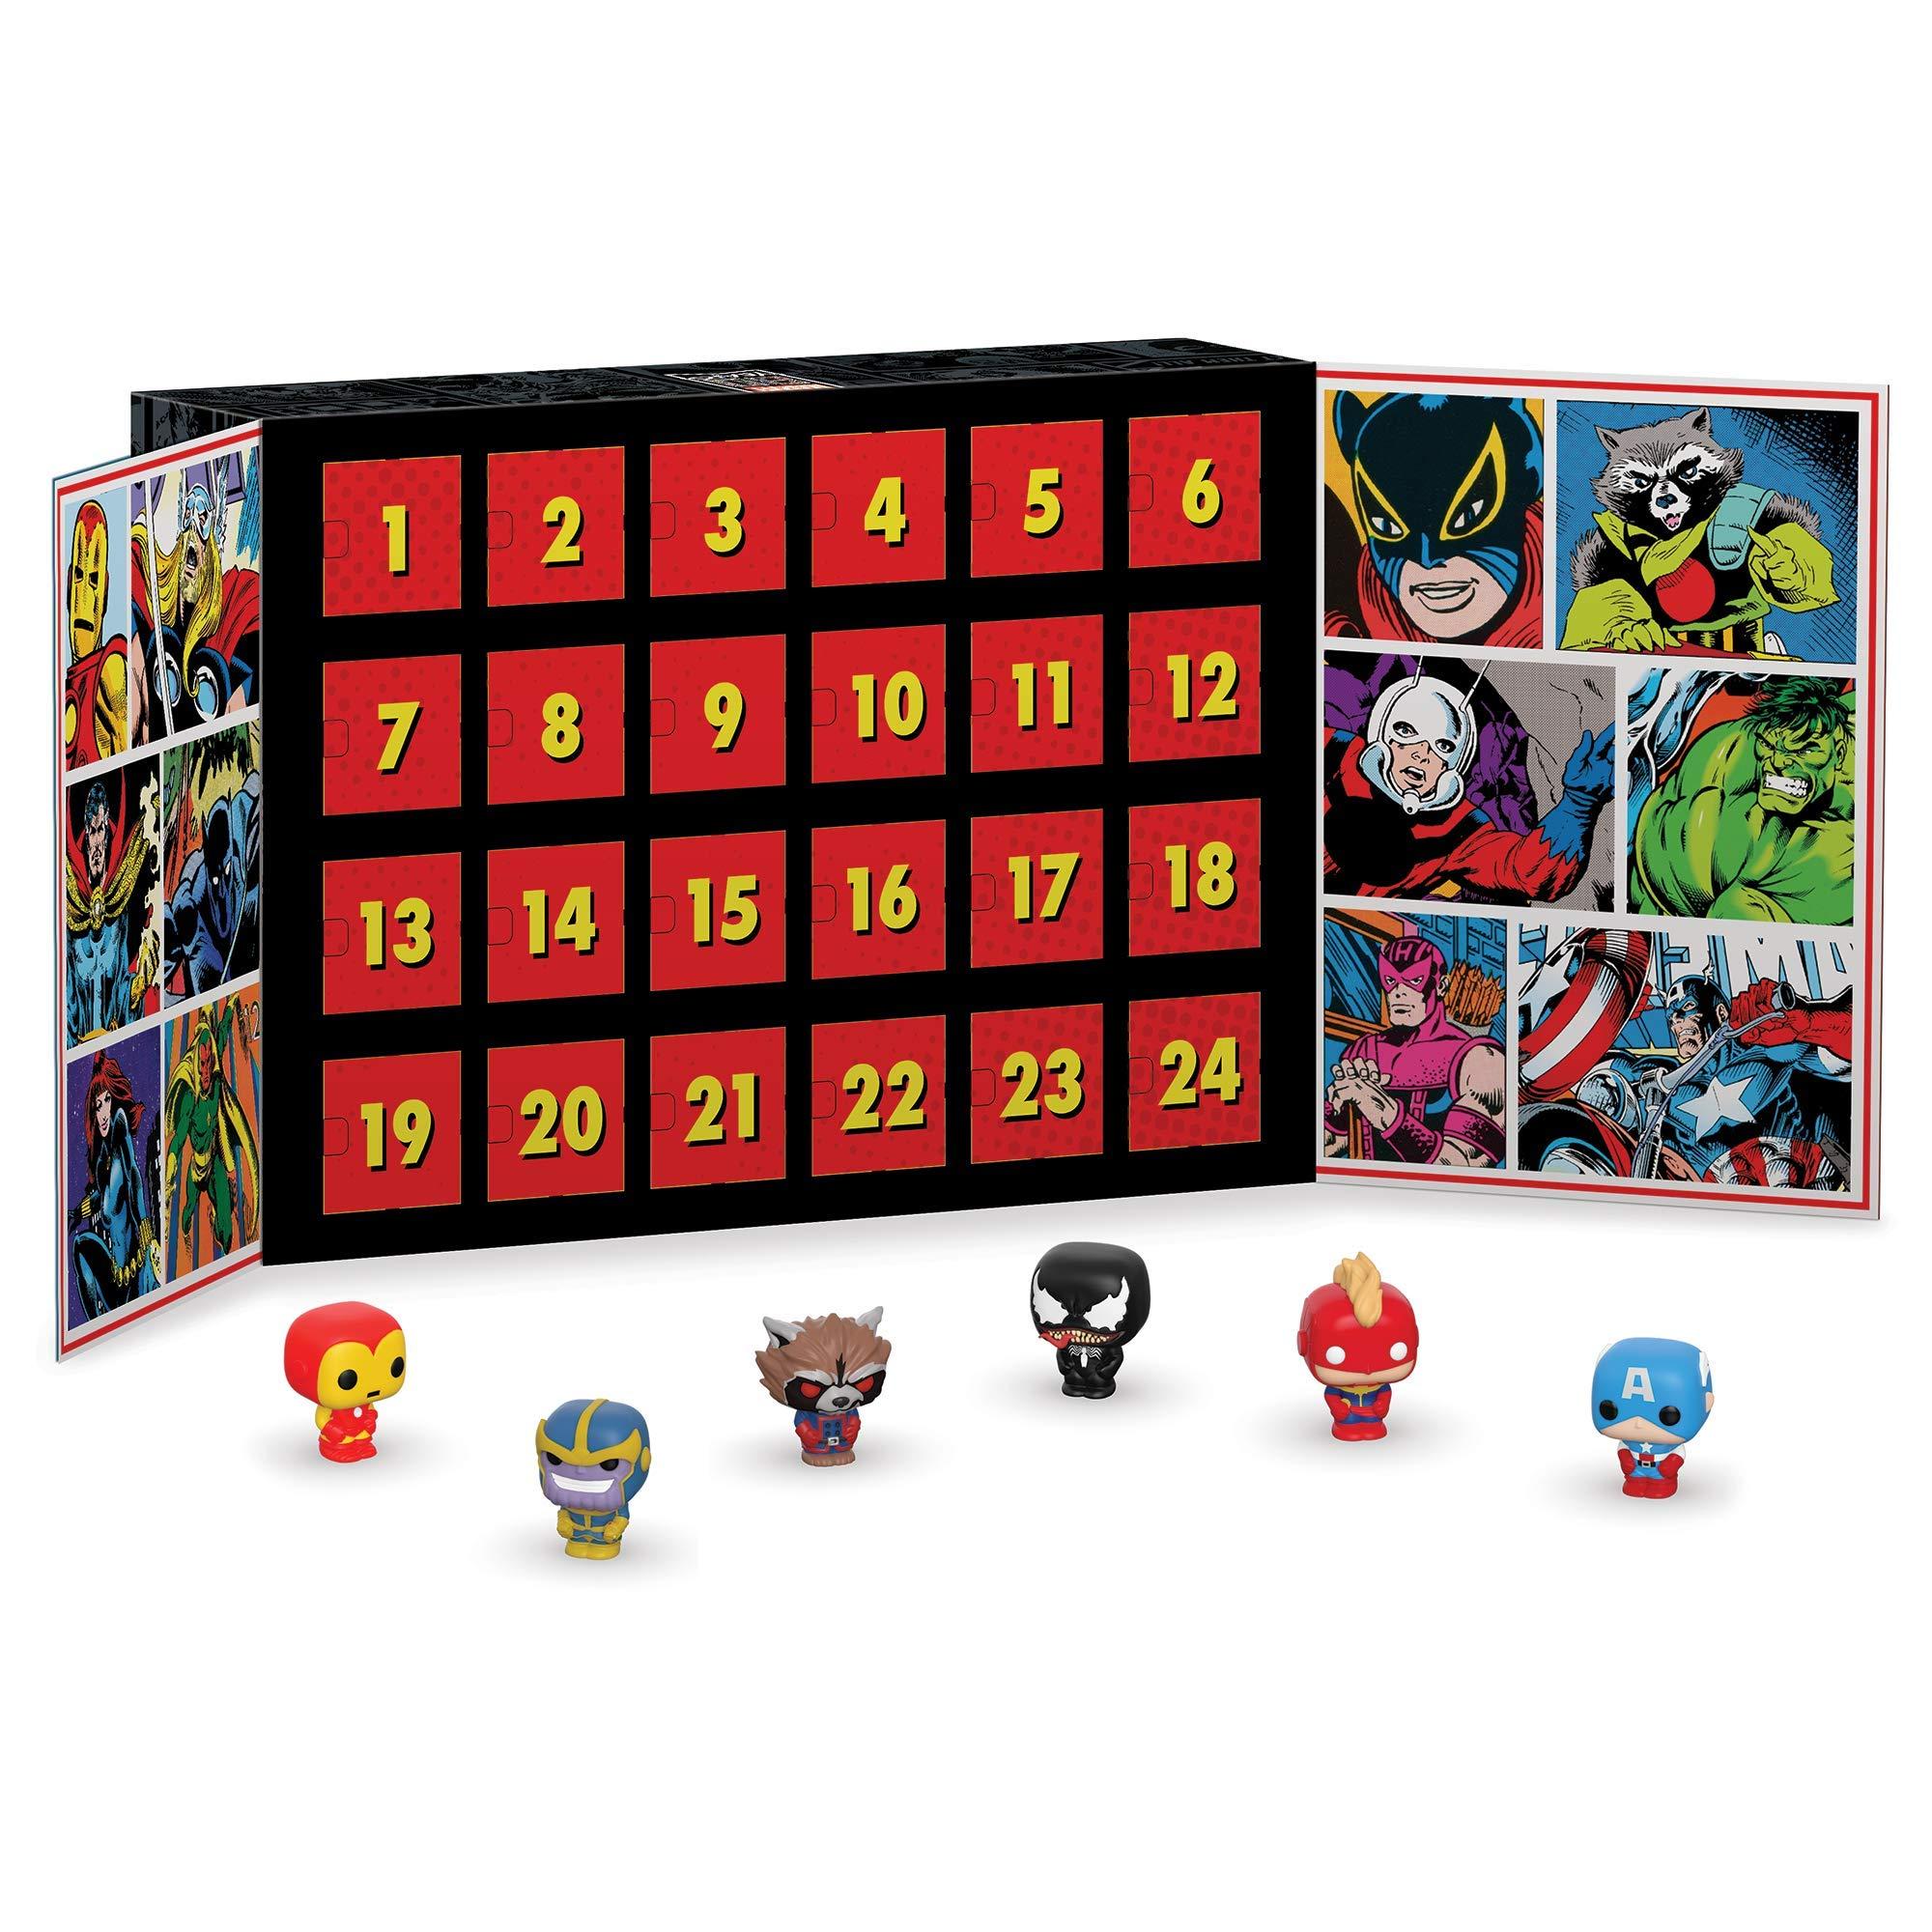 Funko-Advent-Calendar-Calendario-Adviento-Marvel-Multicolor-42752